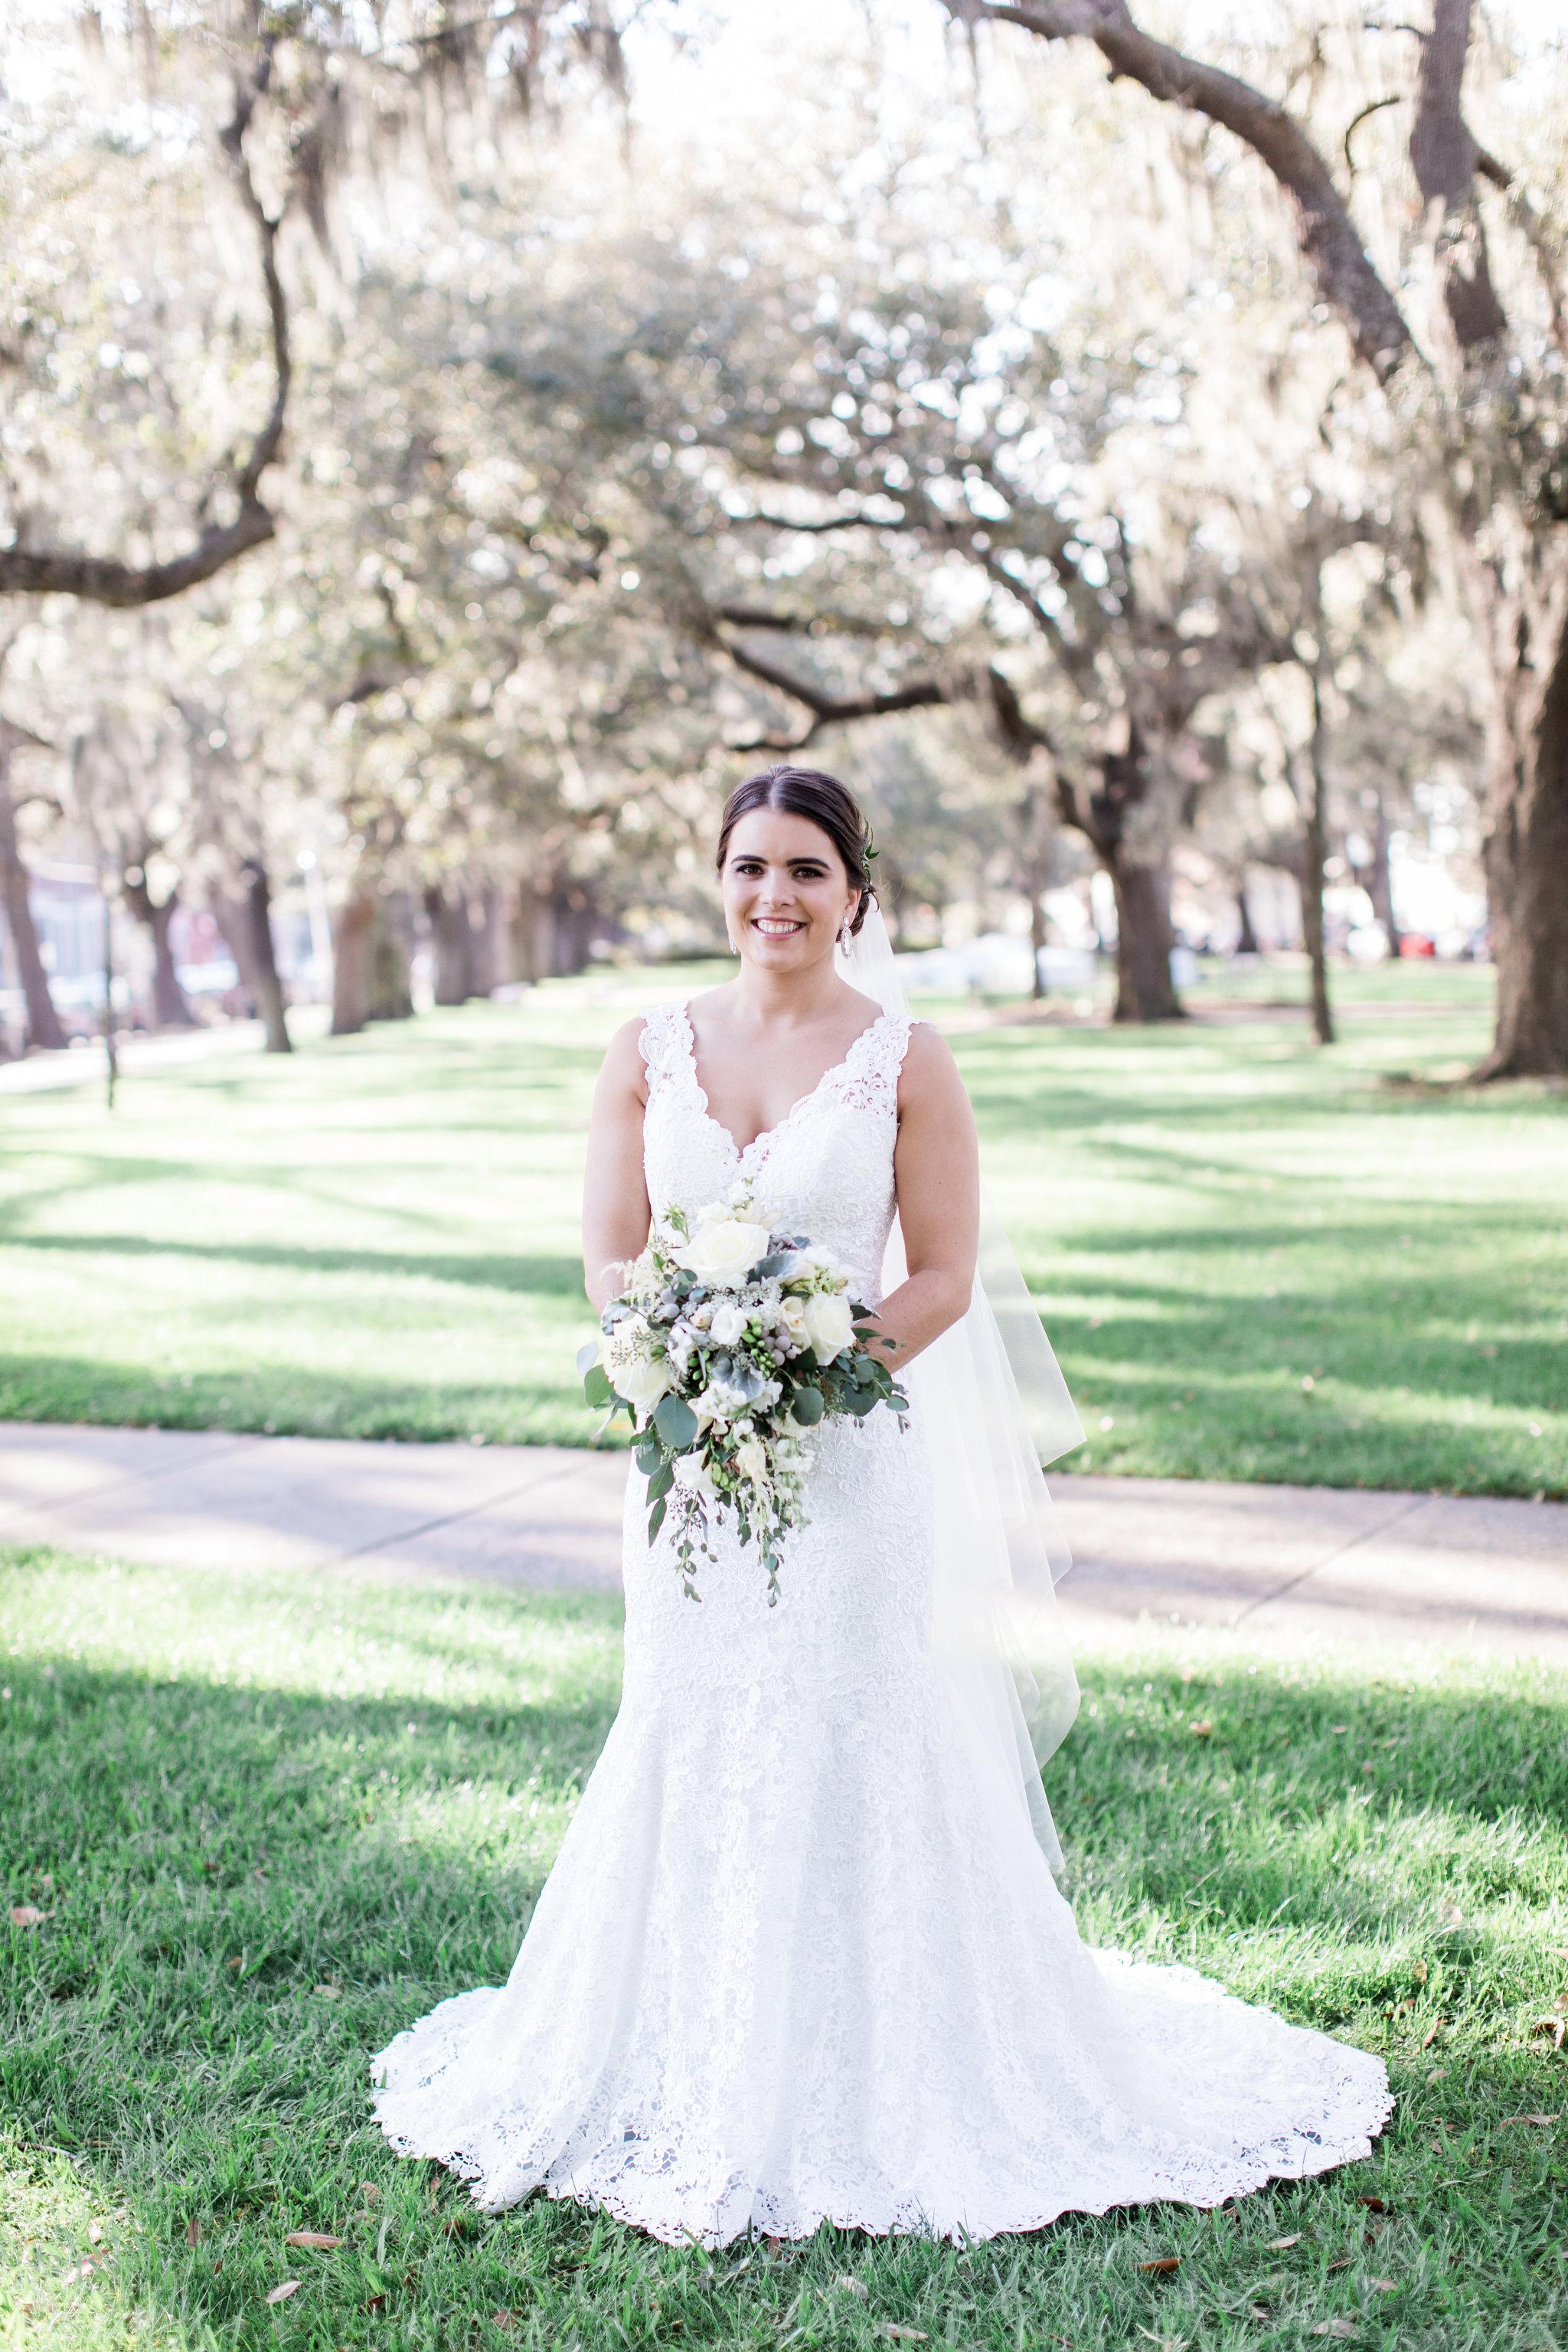 apt-b-photography-Savannah-wedding-photographer-savannah-engagement-photographer-historic-savannah-engagement-charles-h-morris-center-wedding-savannah-weddings-20.JPG